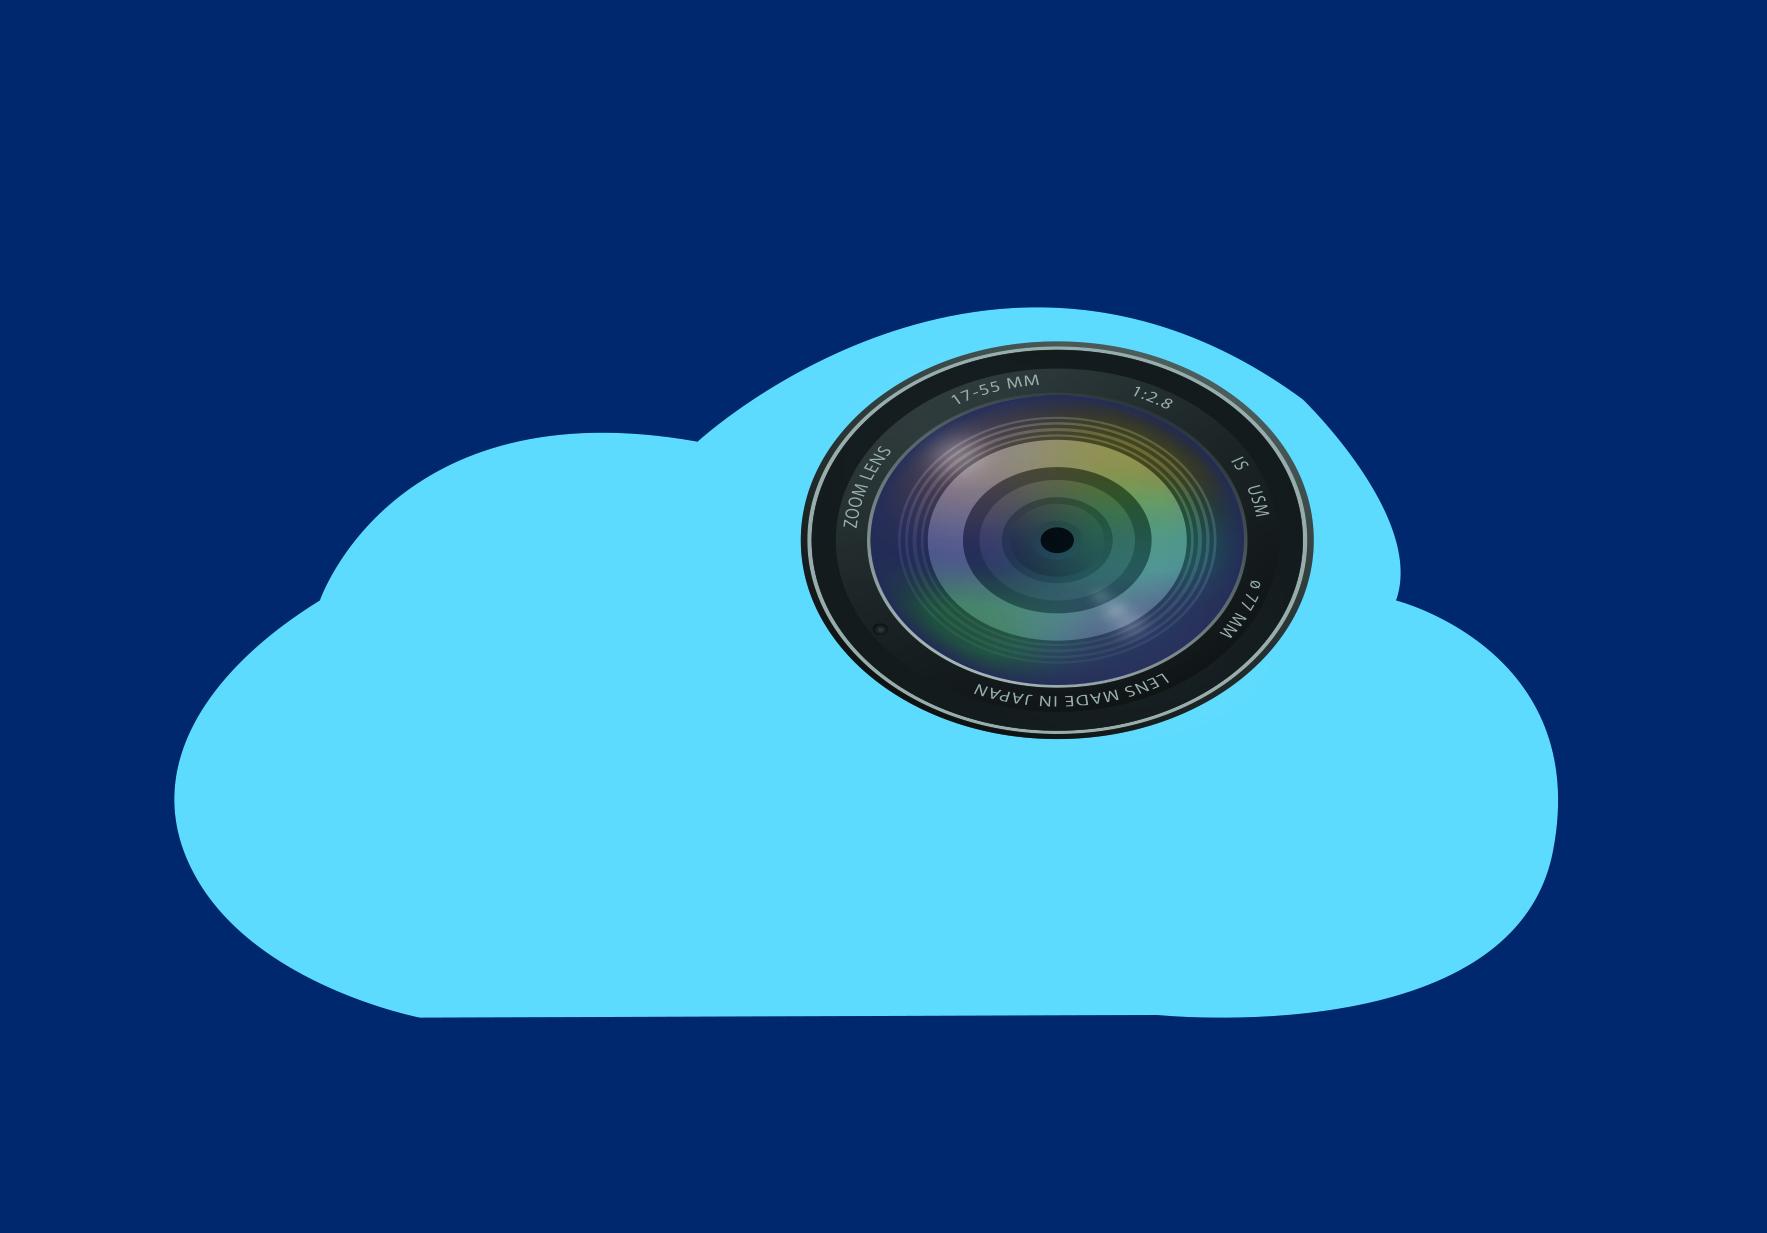 Topsview kamera izleme programı